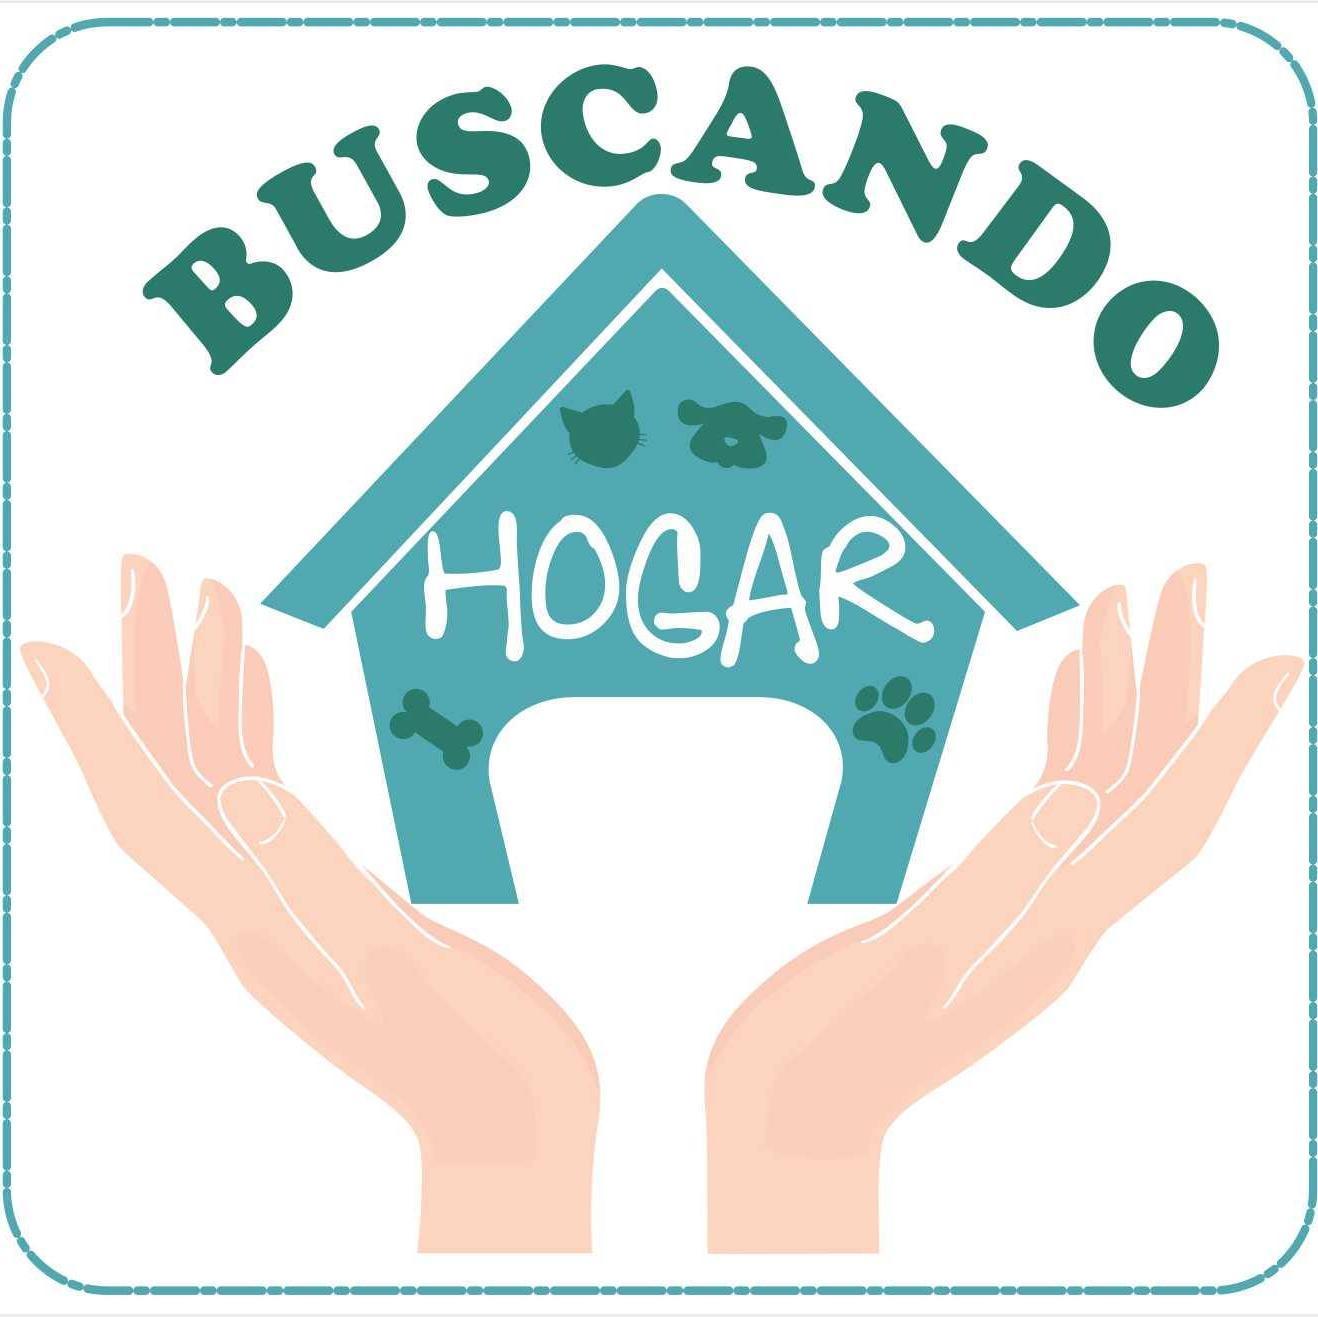 BucandoHogar_Adop